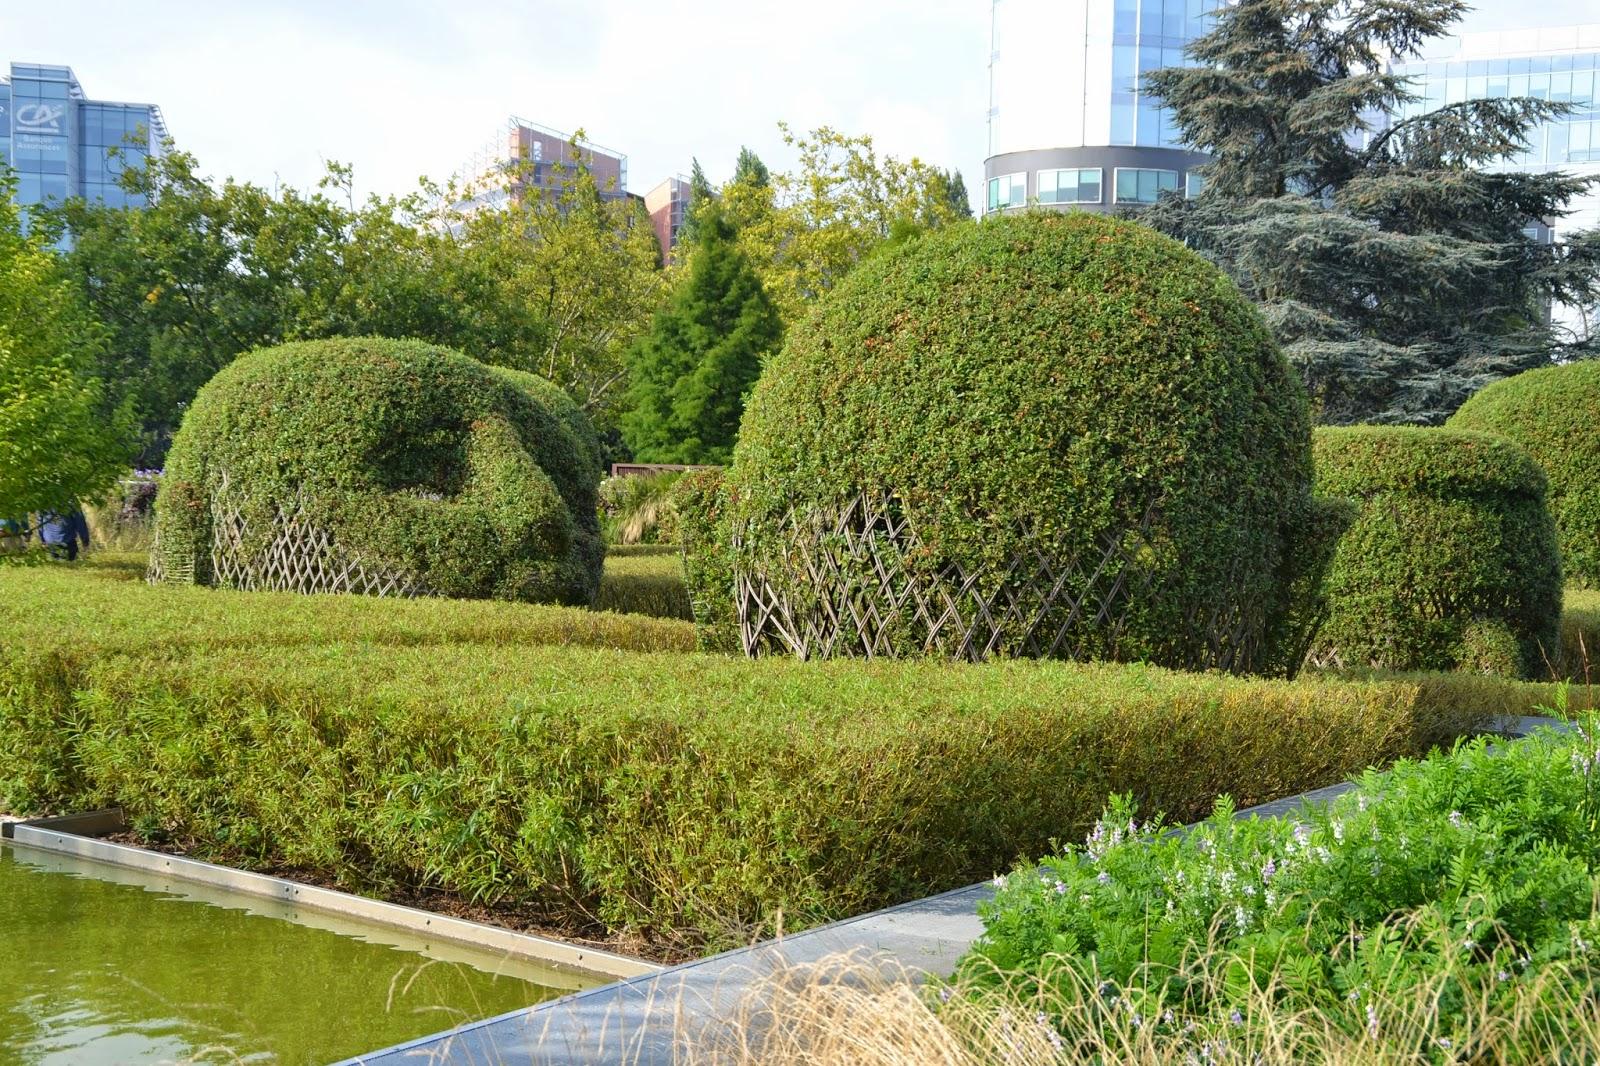 Le jardin des g ants lille miss chocor ve for Le jardin d alix lille